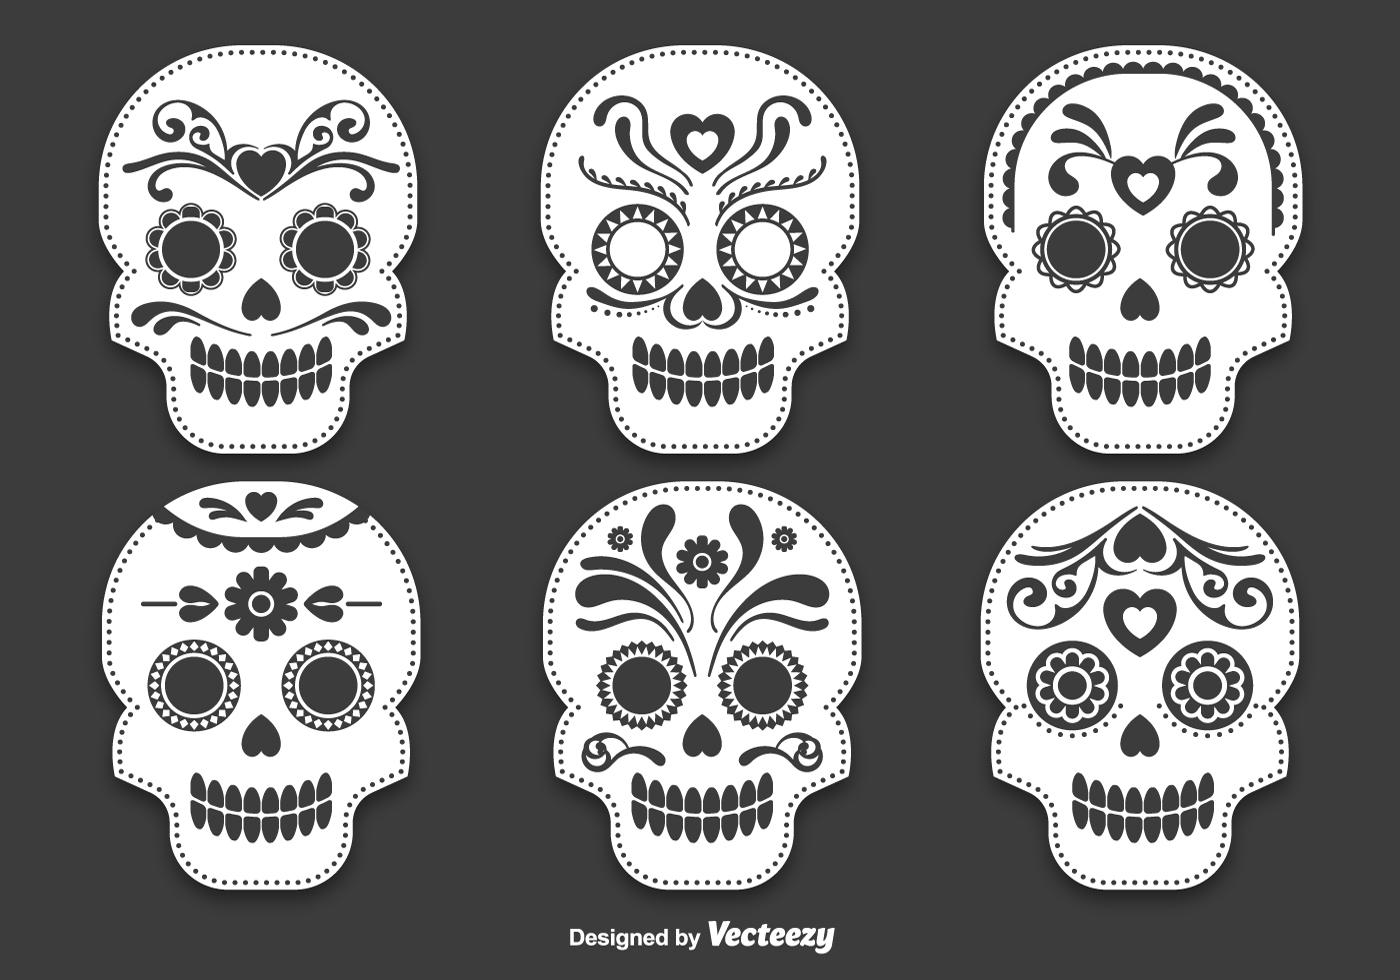 Dead skull vectors download free vector art stock graphics amp images